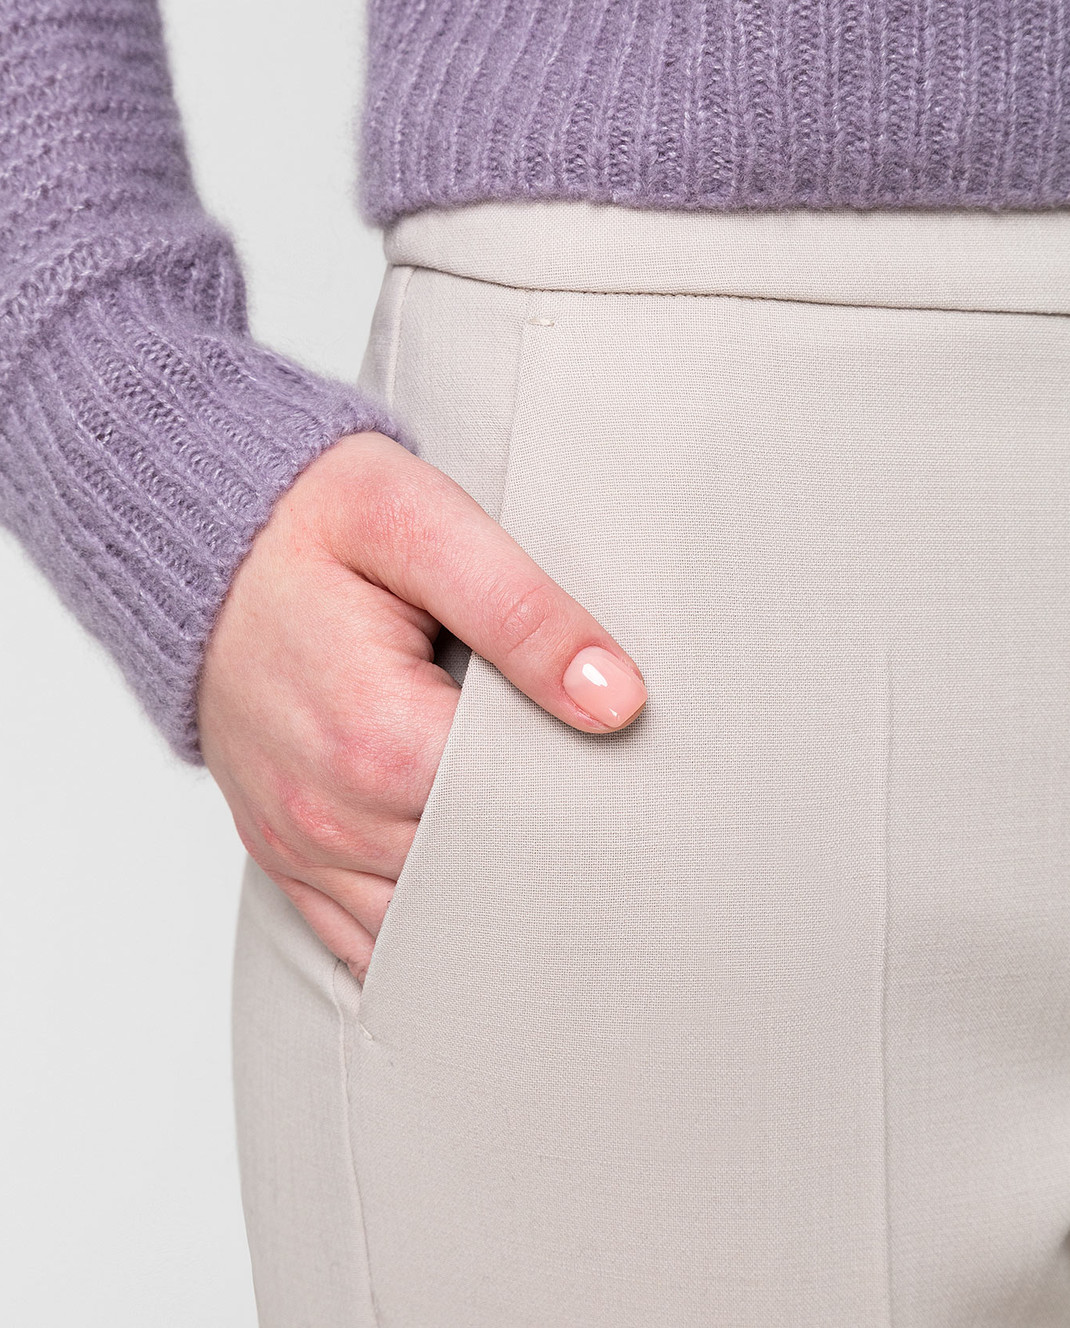 Max Mara Светло-бежевые брюки из шерсти OSTILE изображение 5